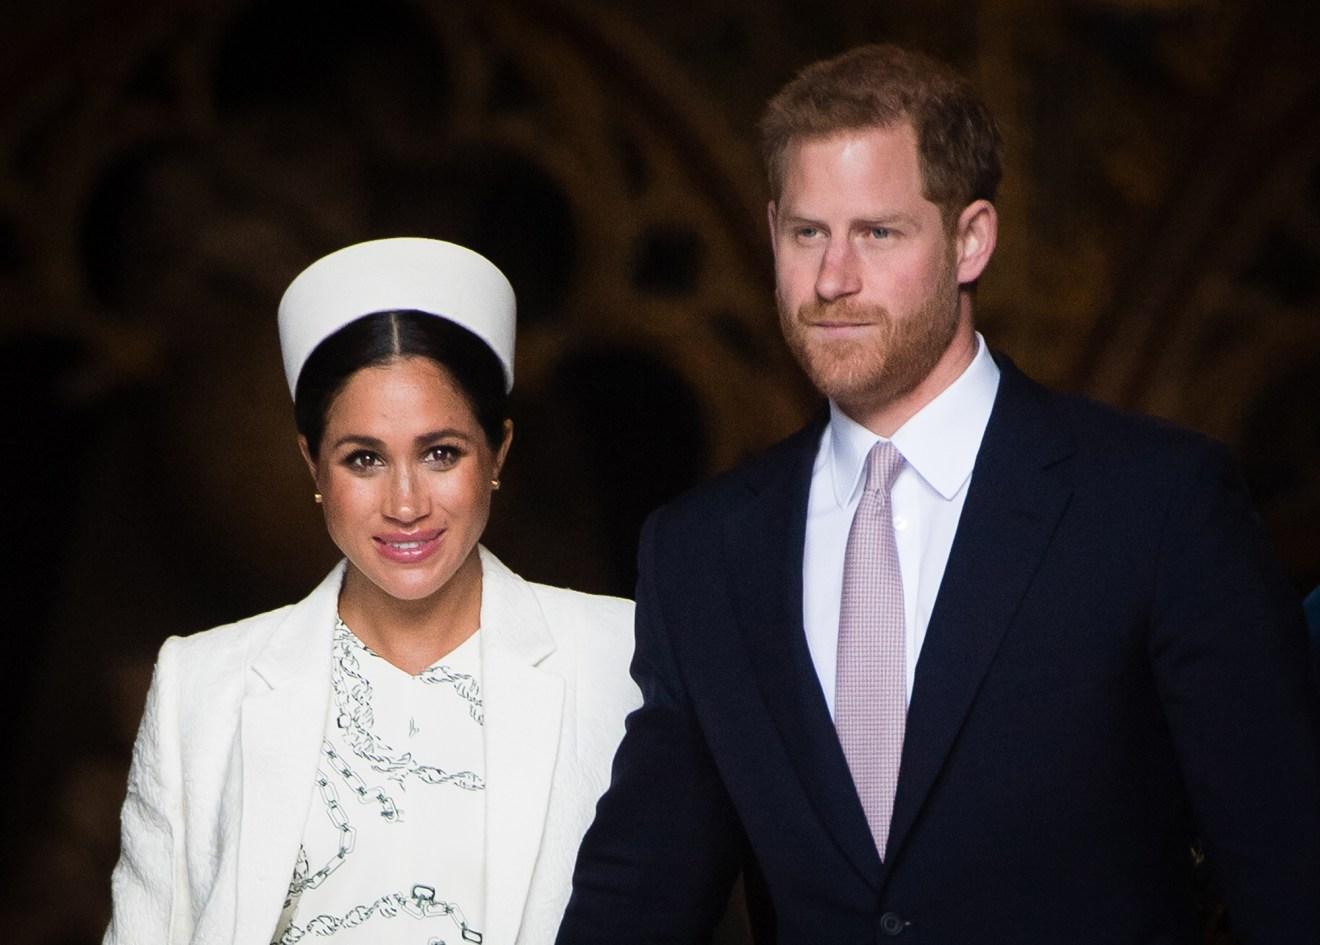 https://www.usmagazine.com/wp content/uploads/2019/05/celebrity babies 2019 meghan markle prince